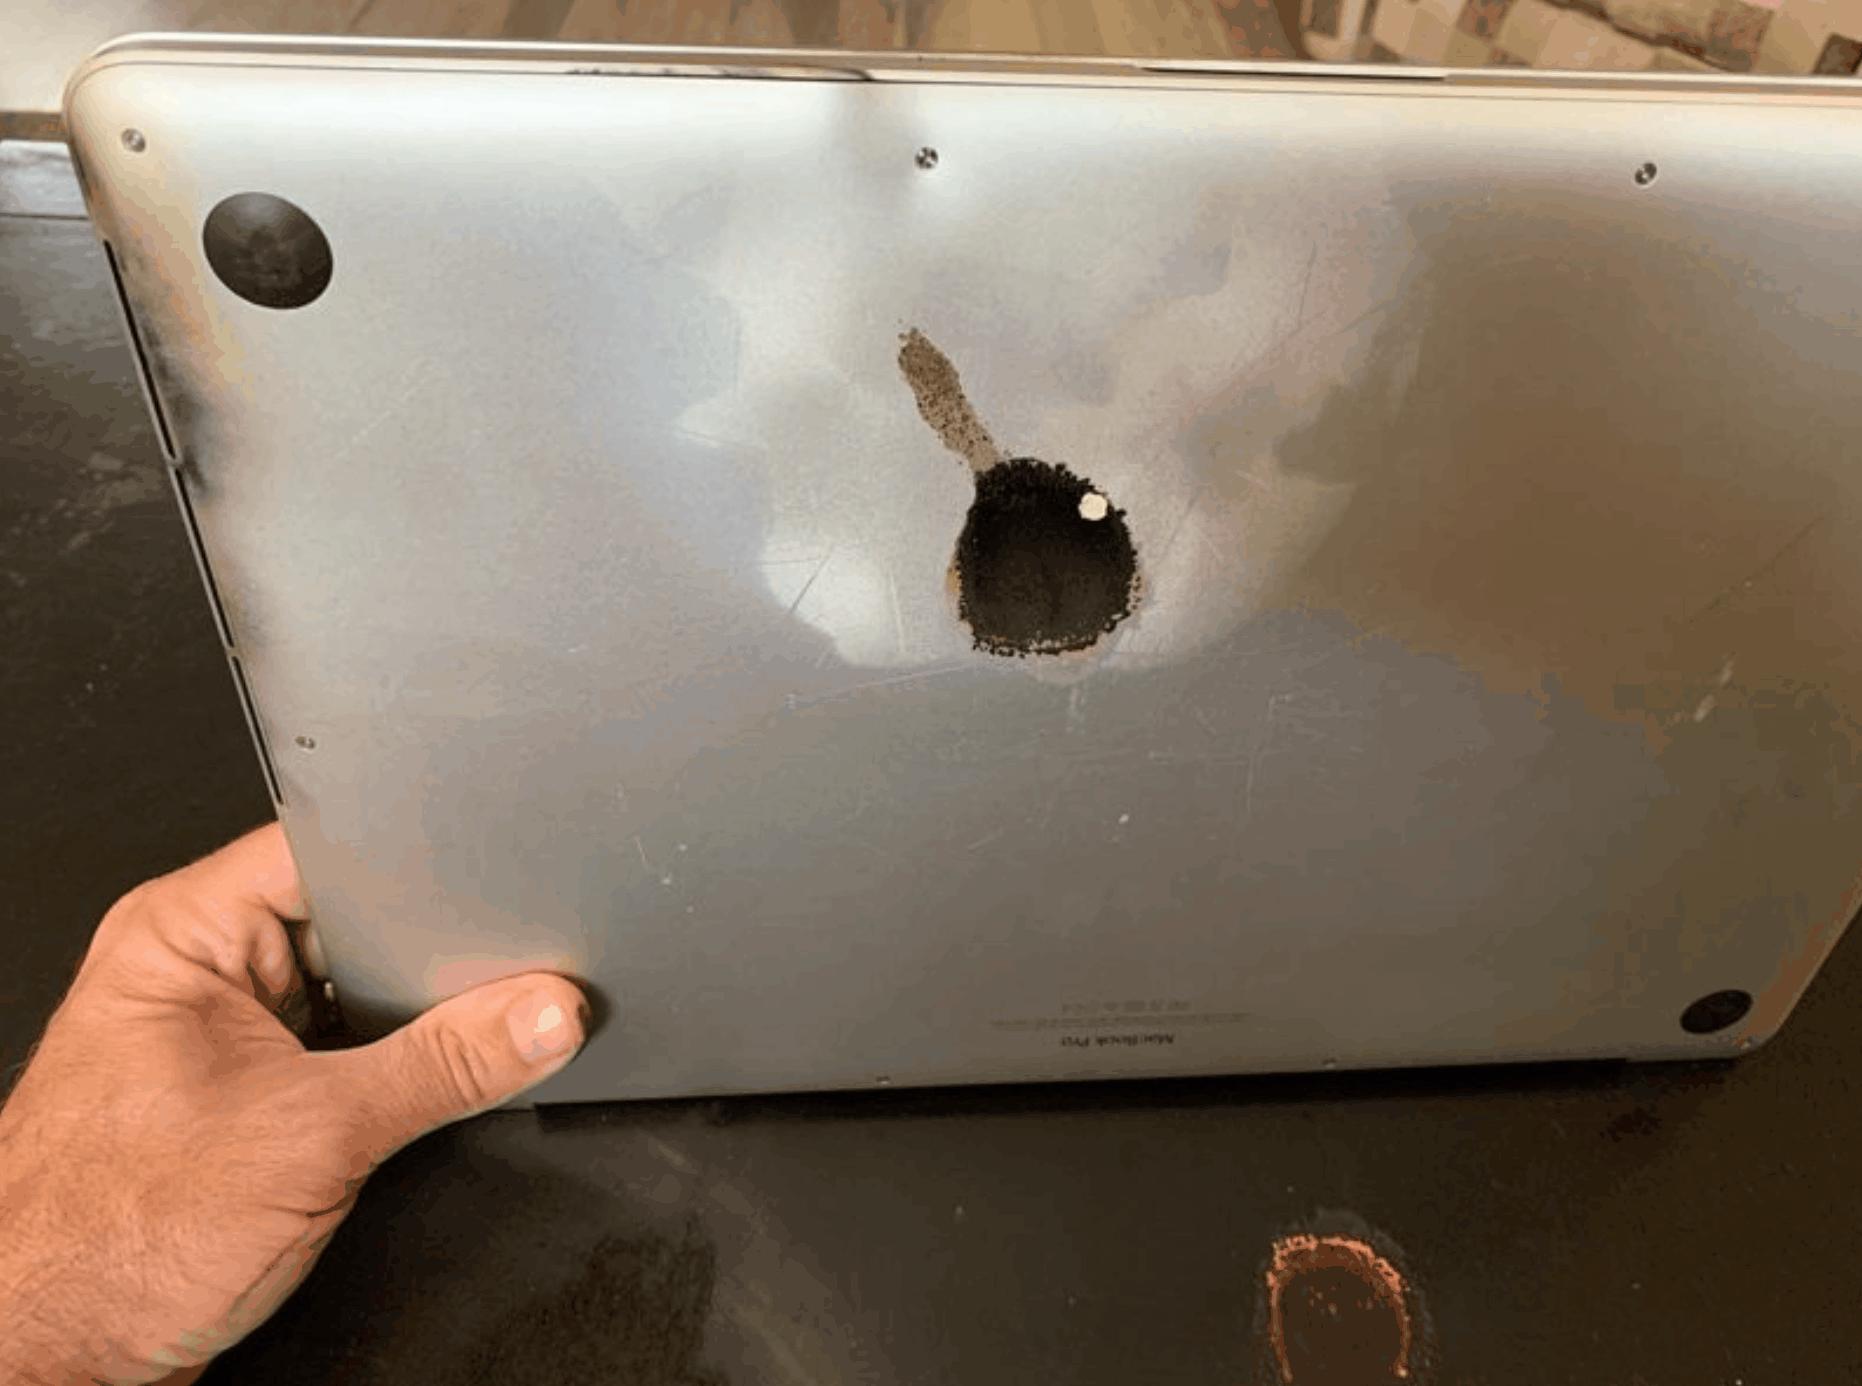 MacBook Pro Explodes